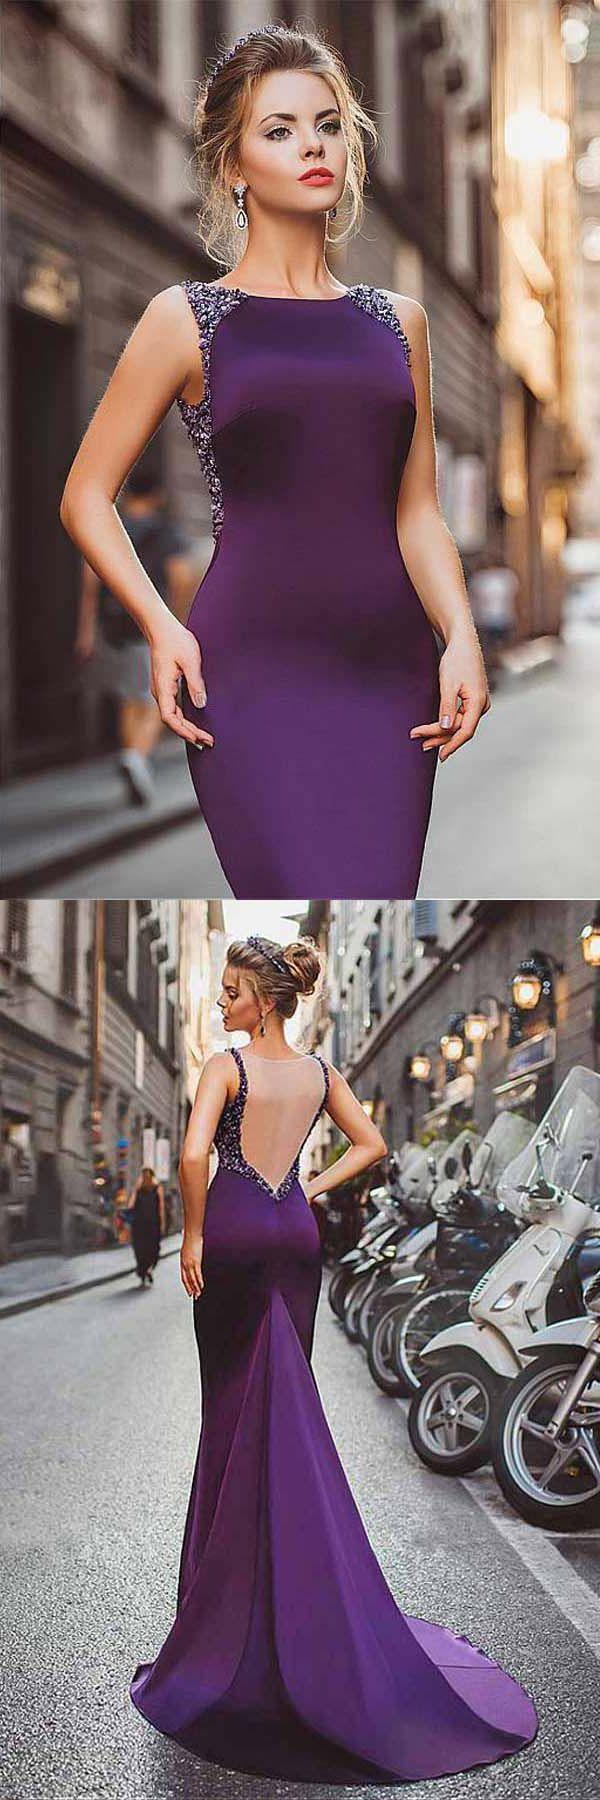 Свадьба - Cheap Trendy Prom Dresses Mermaid Neckline Satin Purple Mermaid Evening Dresses With Beadings